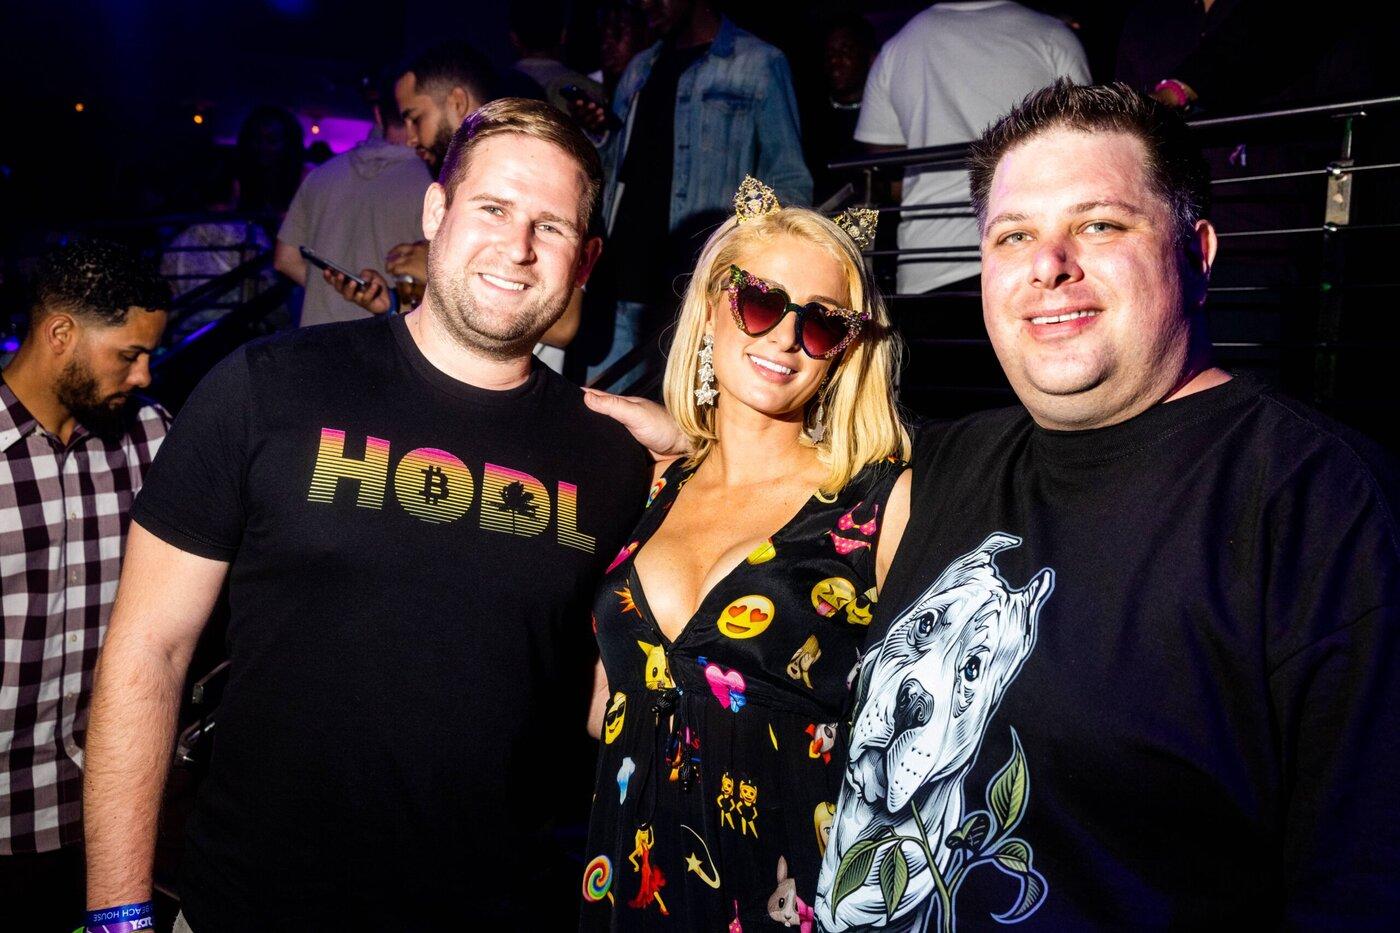 Dan Held, Paris Hilton, and Riccardo Spagni at STORY Nightclub in Miami on June 5, 2021.